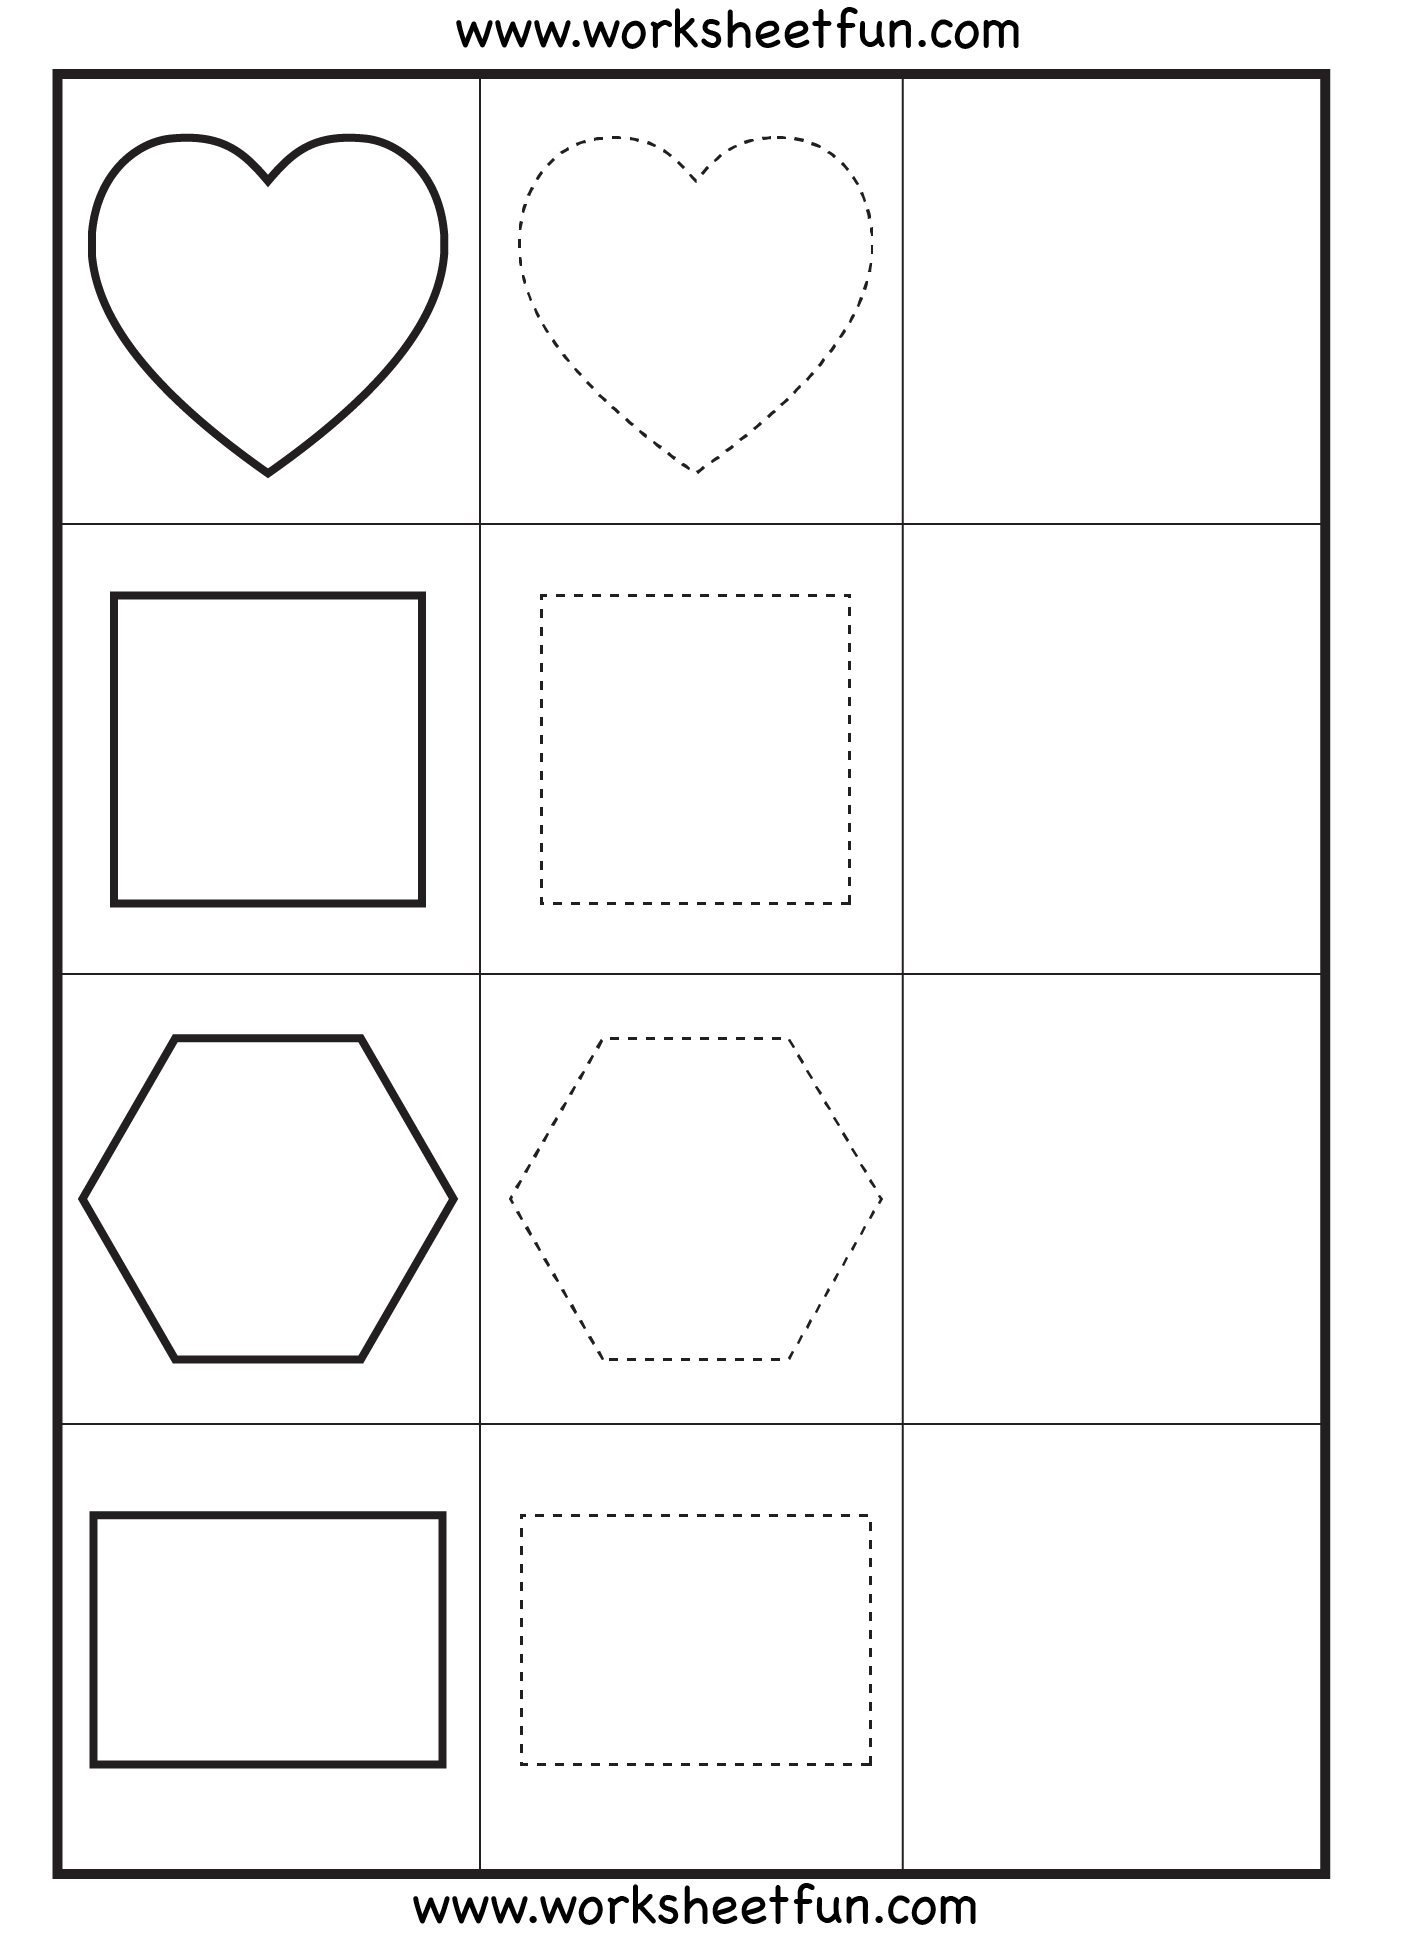 Tracing Worksheets And Worksheets